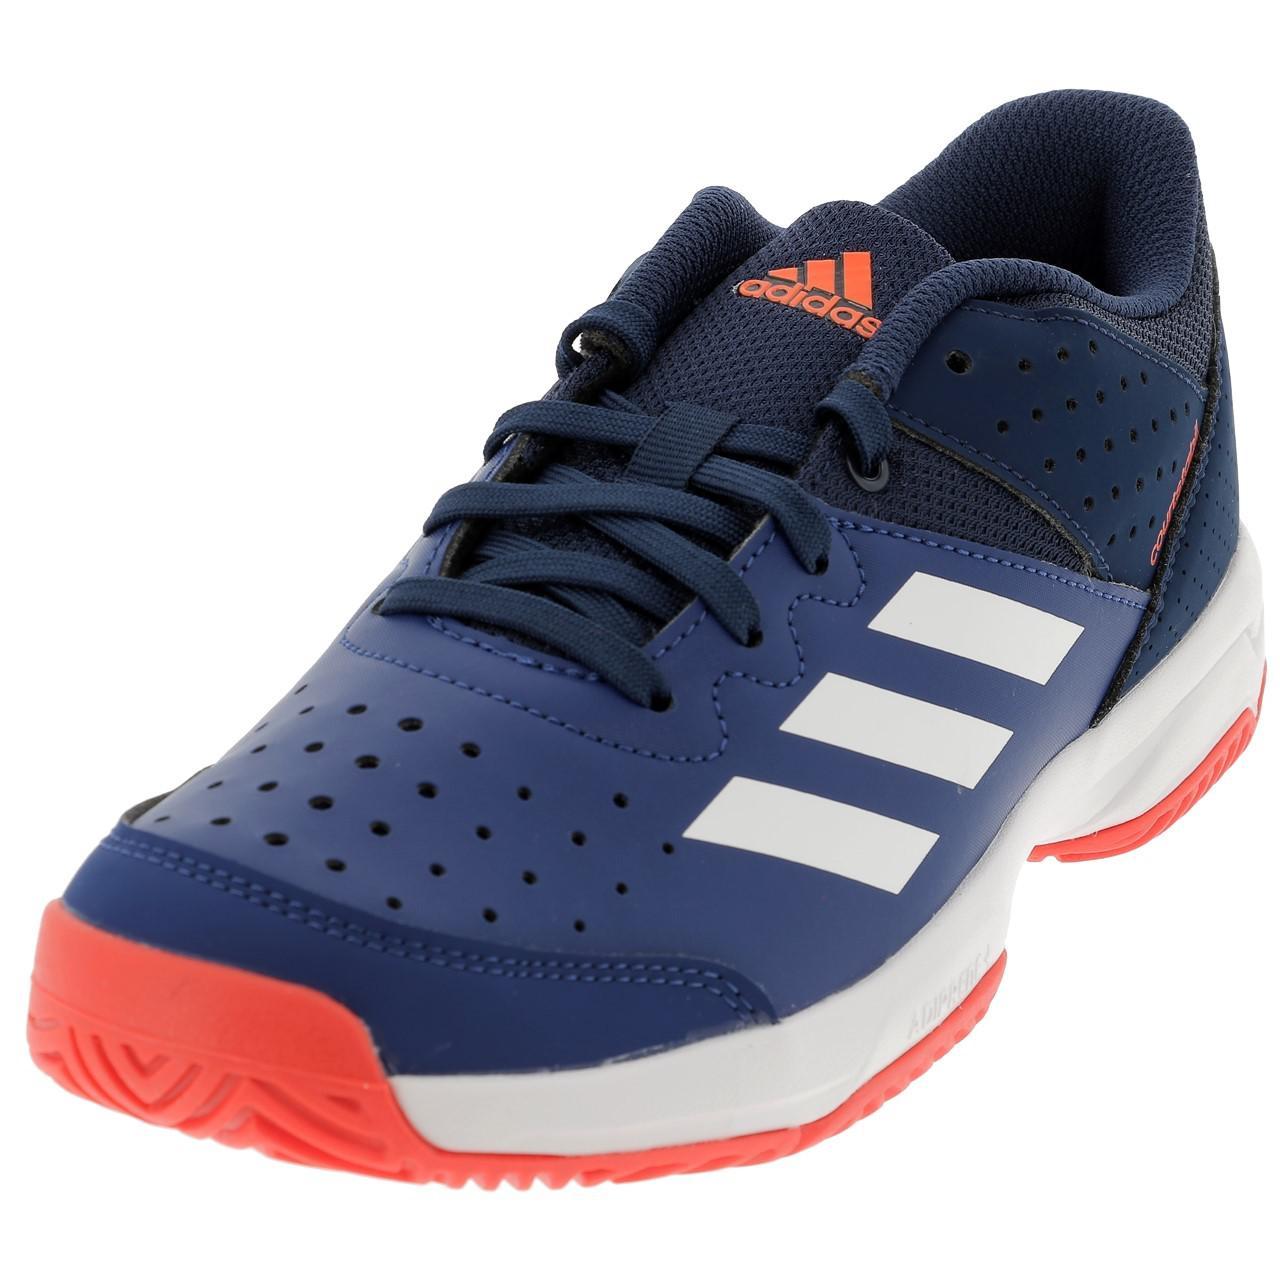 exclusive range separation shoes most popular Handball shoes adidas court stabil jr blue blue 36248-new   eBay